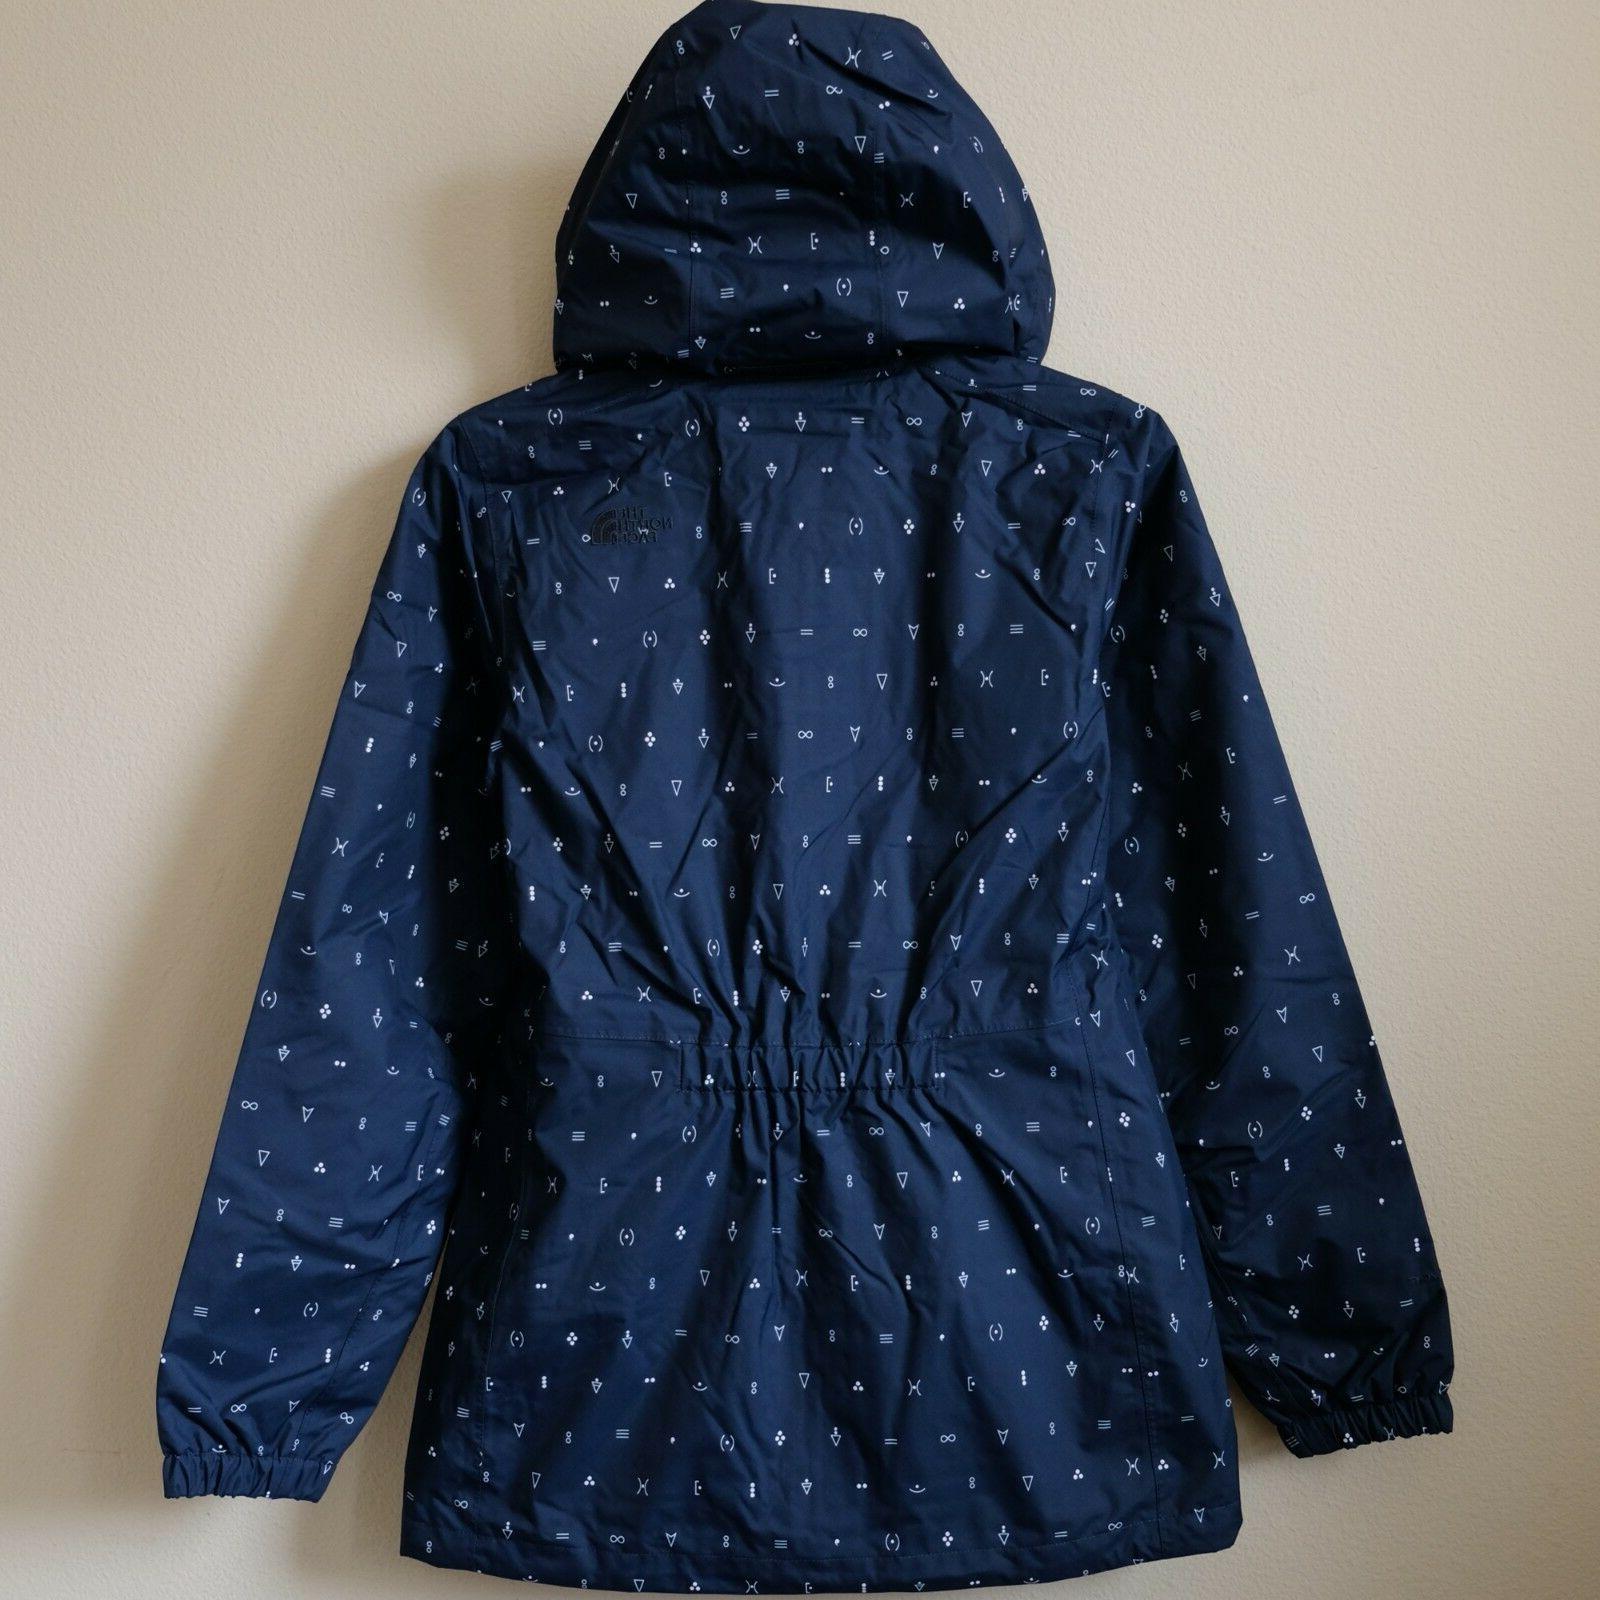 The Resolve Parka Jacket